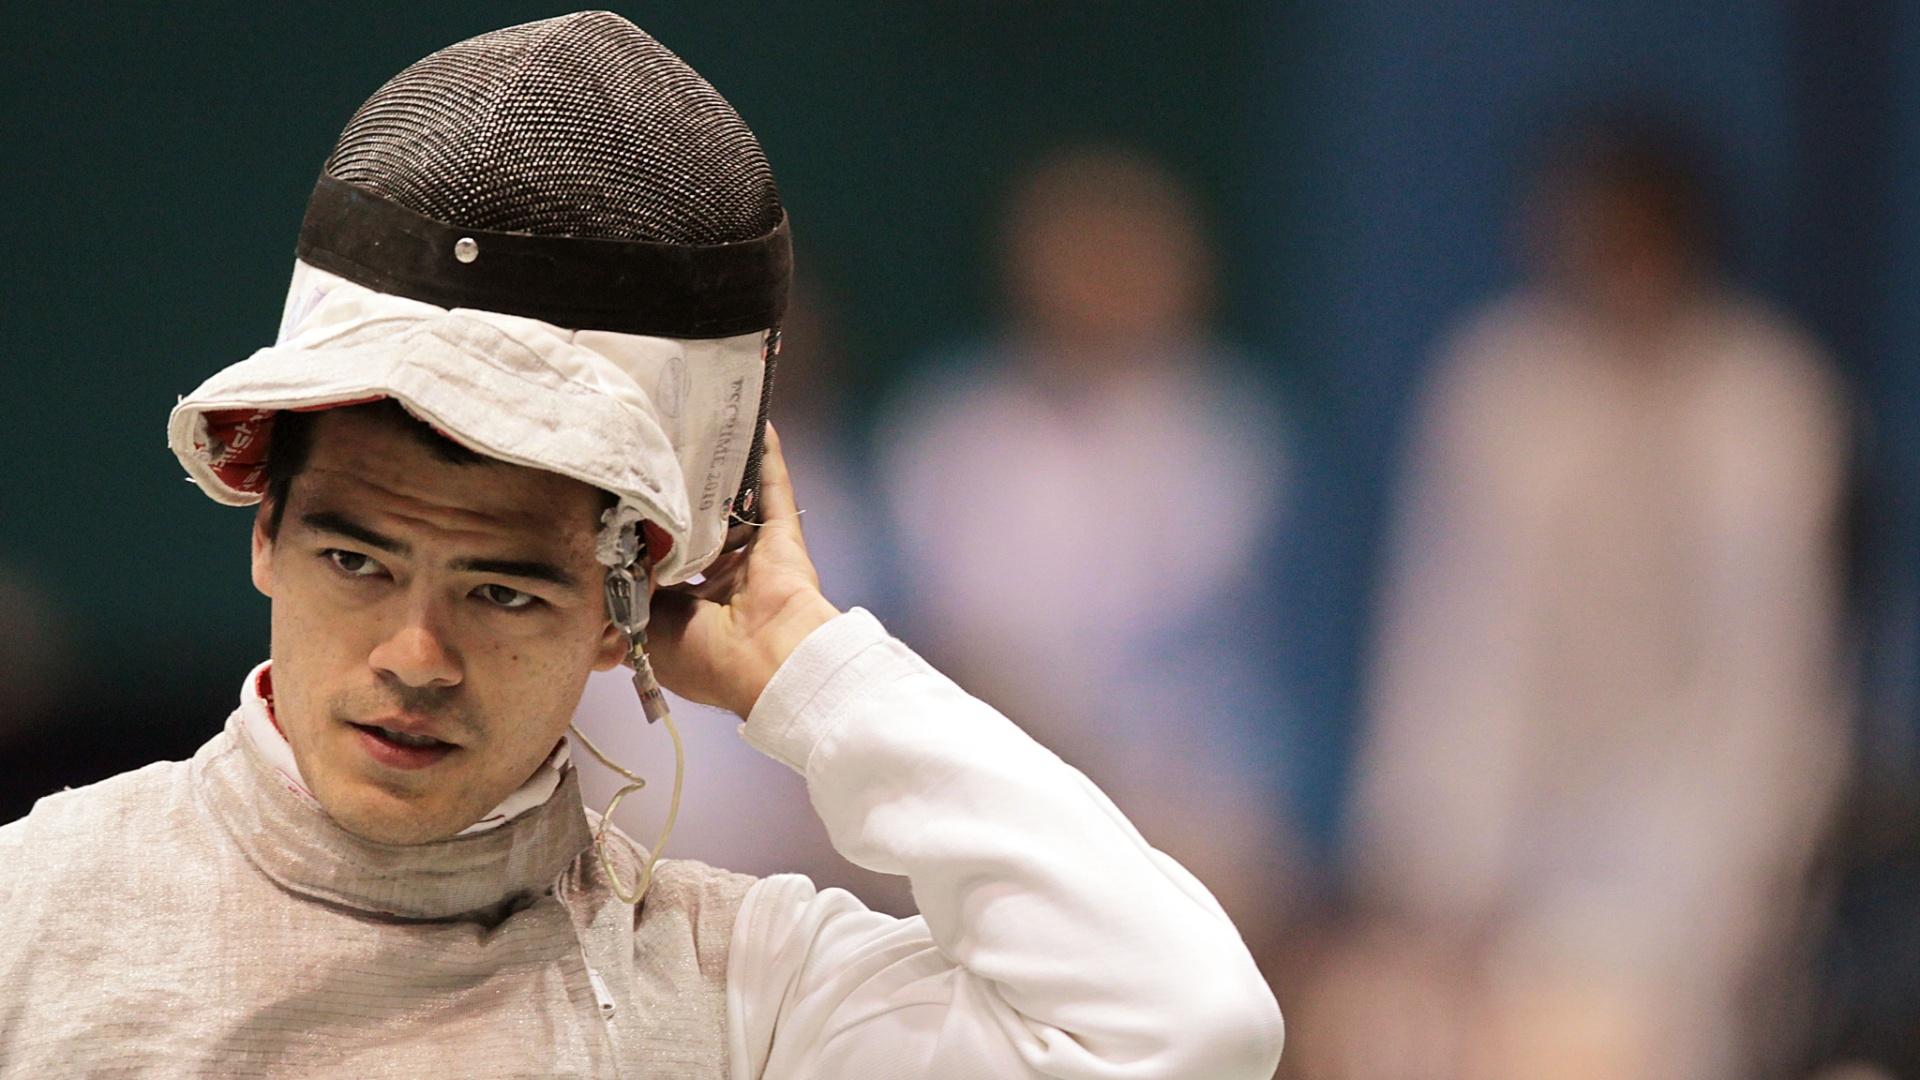 Brasileiro Heitor Shimbo foi eliminado na fase classificatória da disputa do florete masculino (25/10/2011)